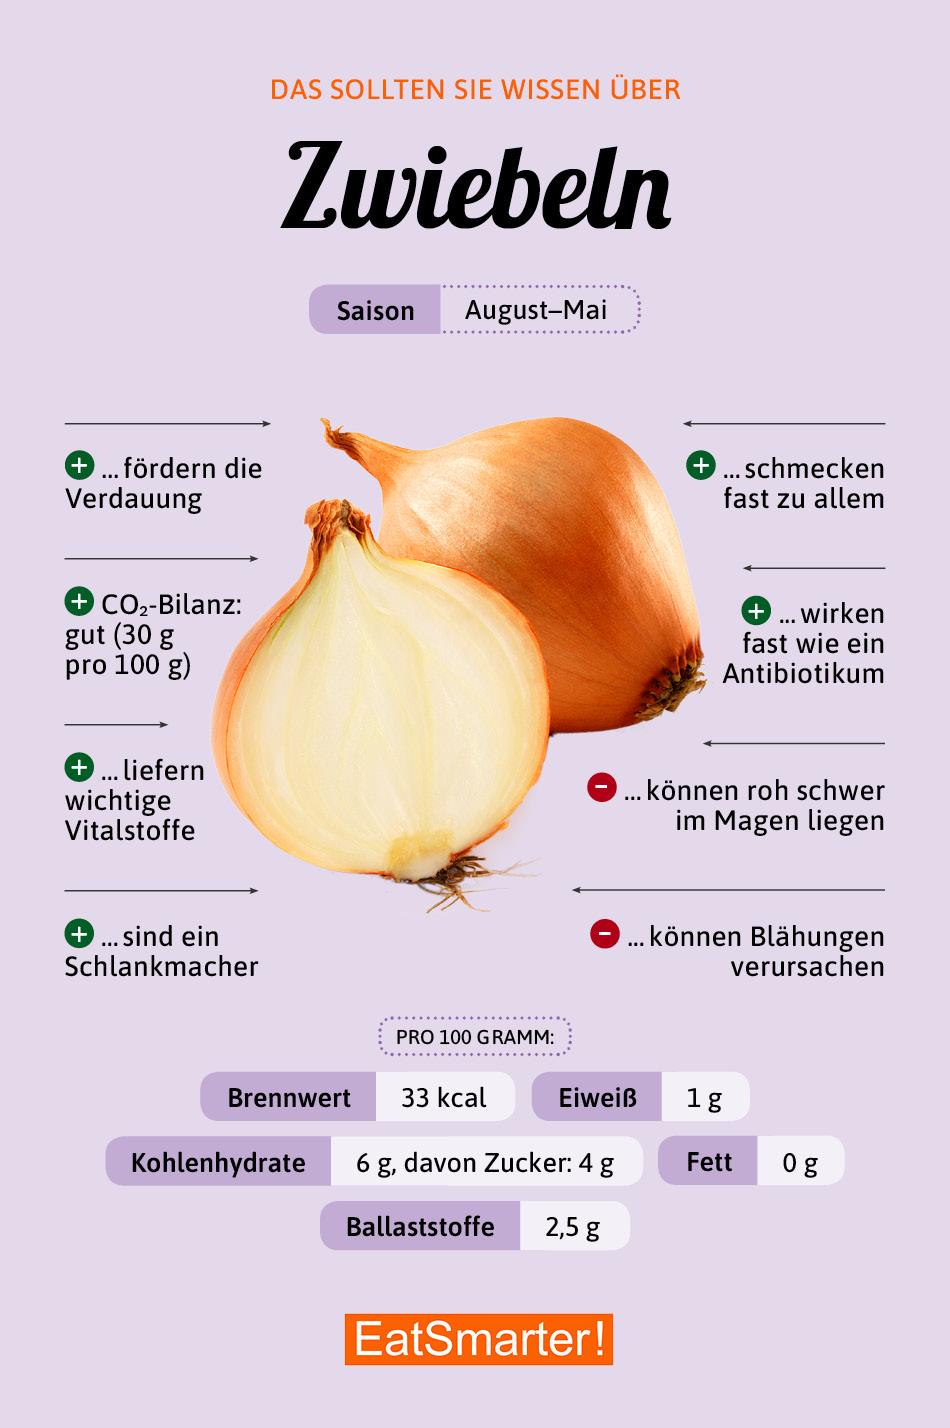 Warenkunde Zwiebeln Infografik